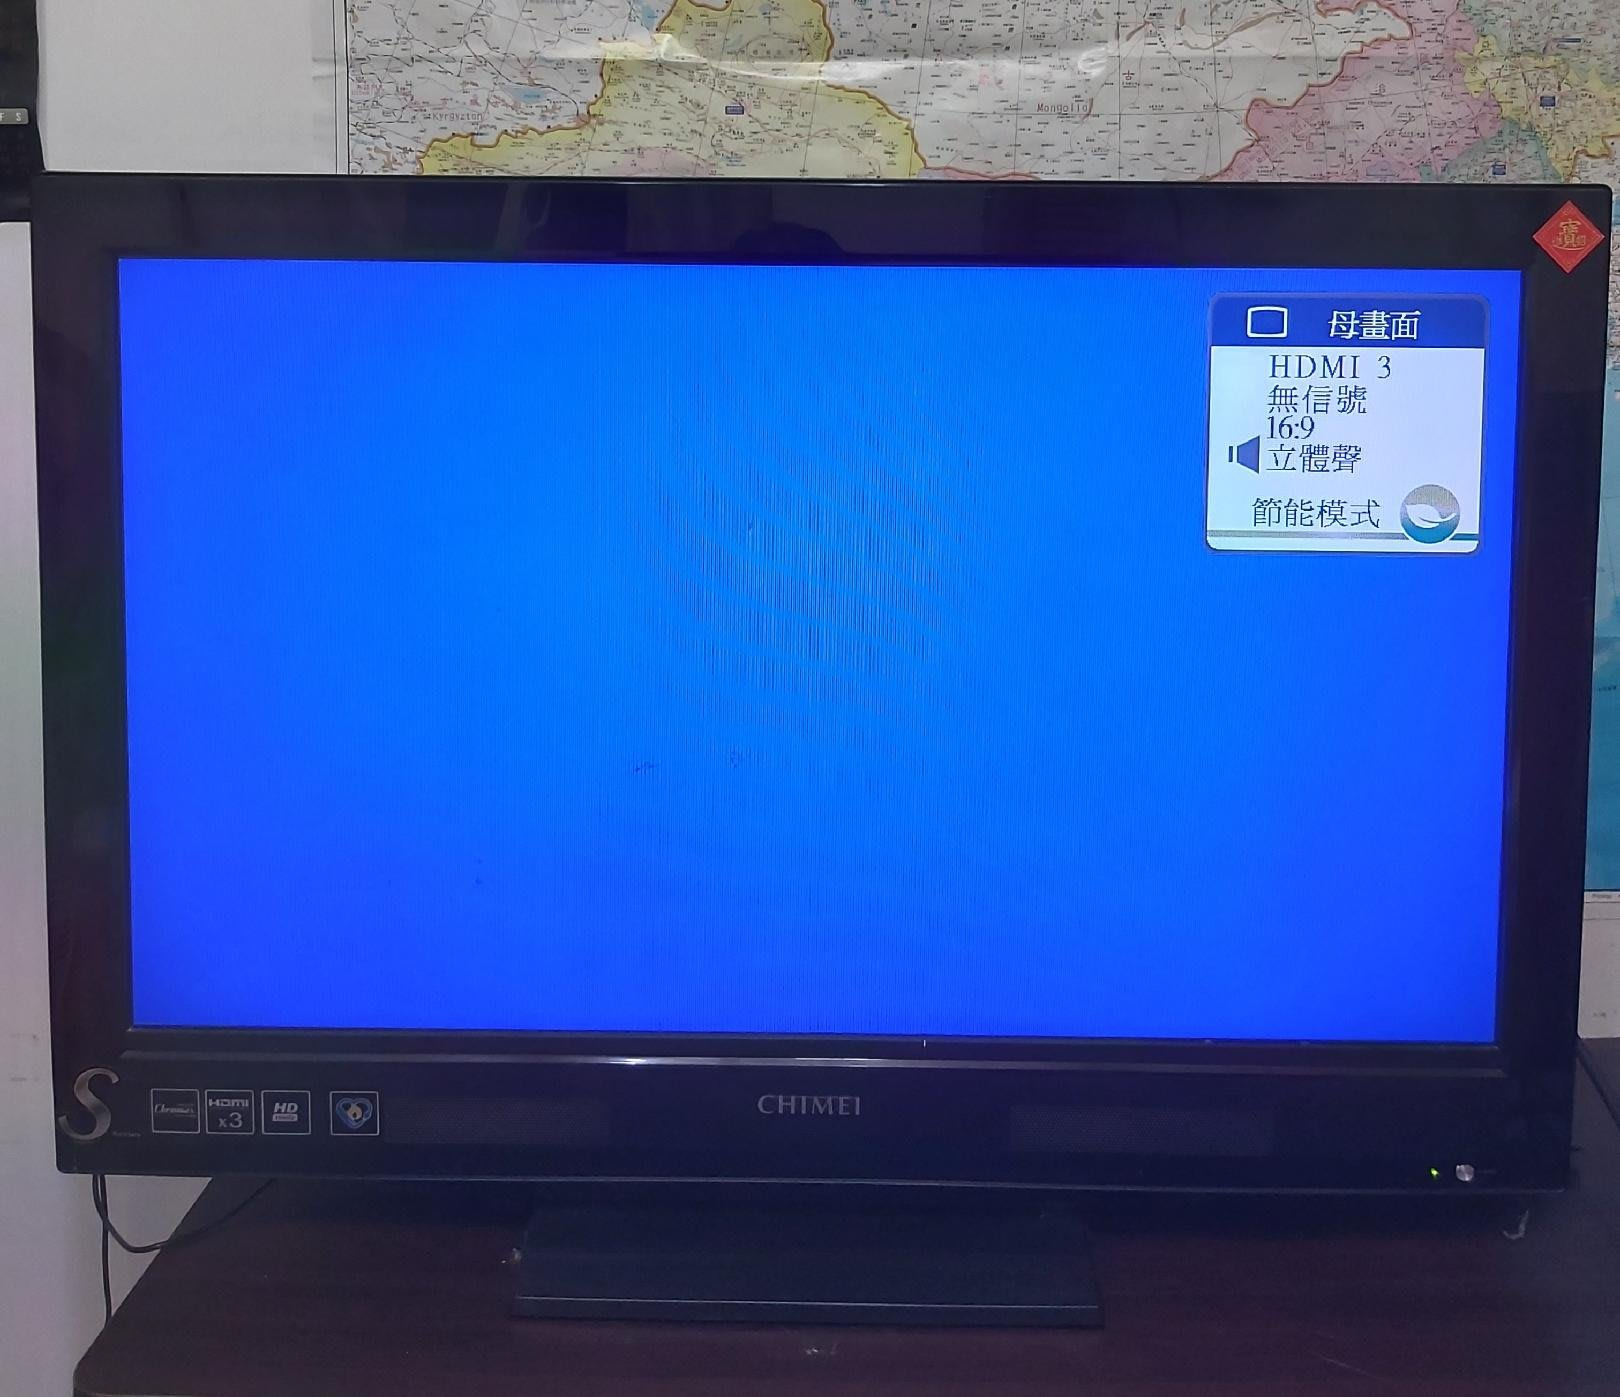 CHIMEI 32吋電視